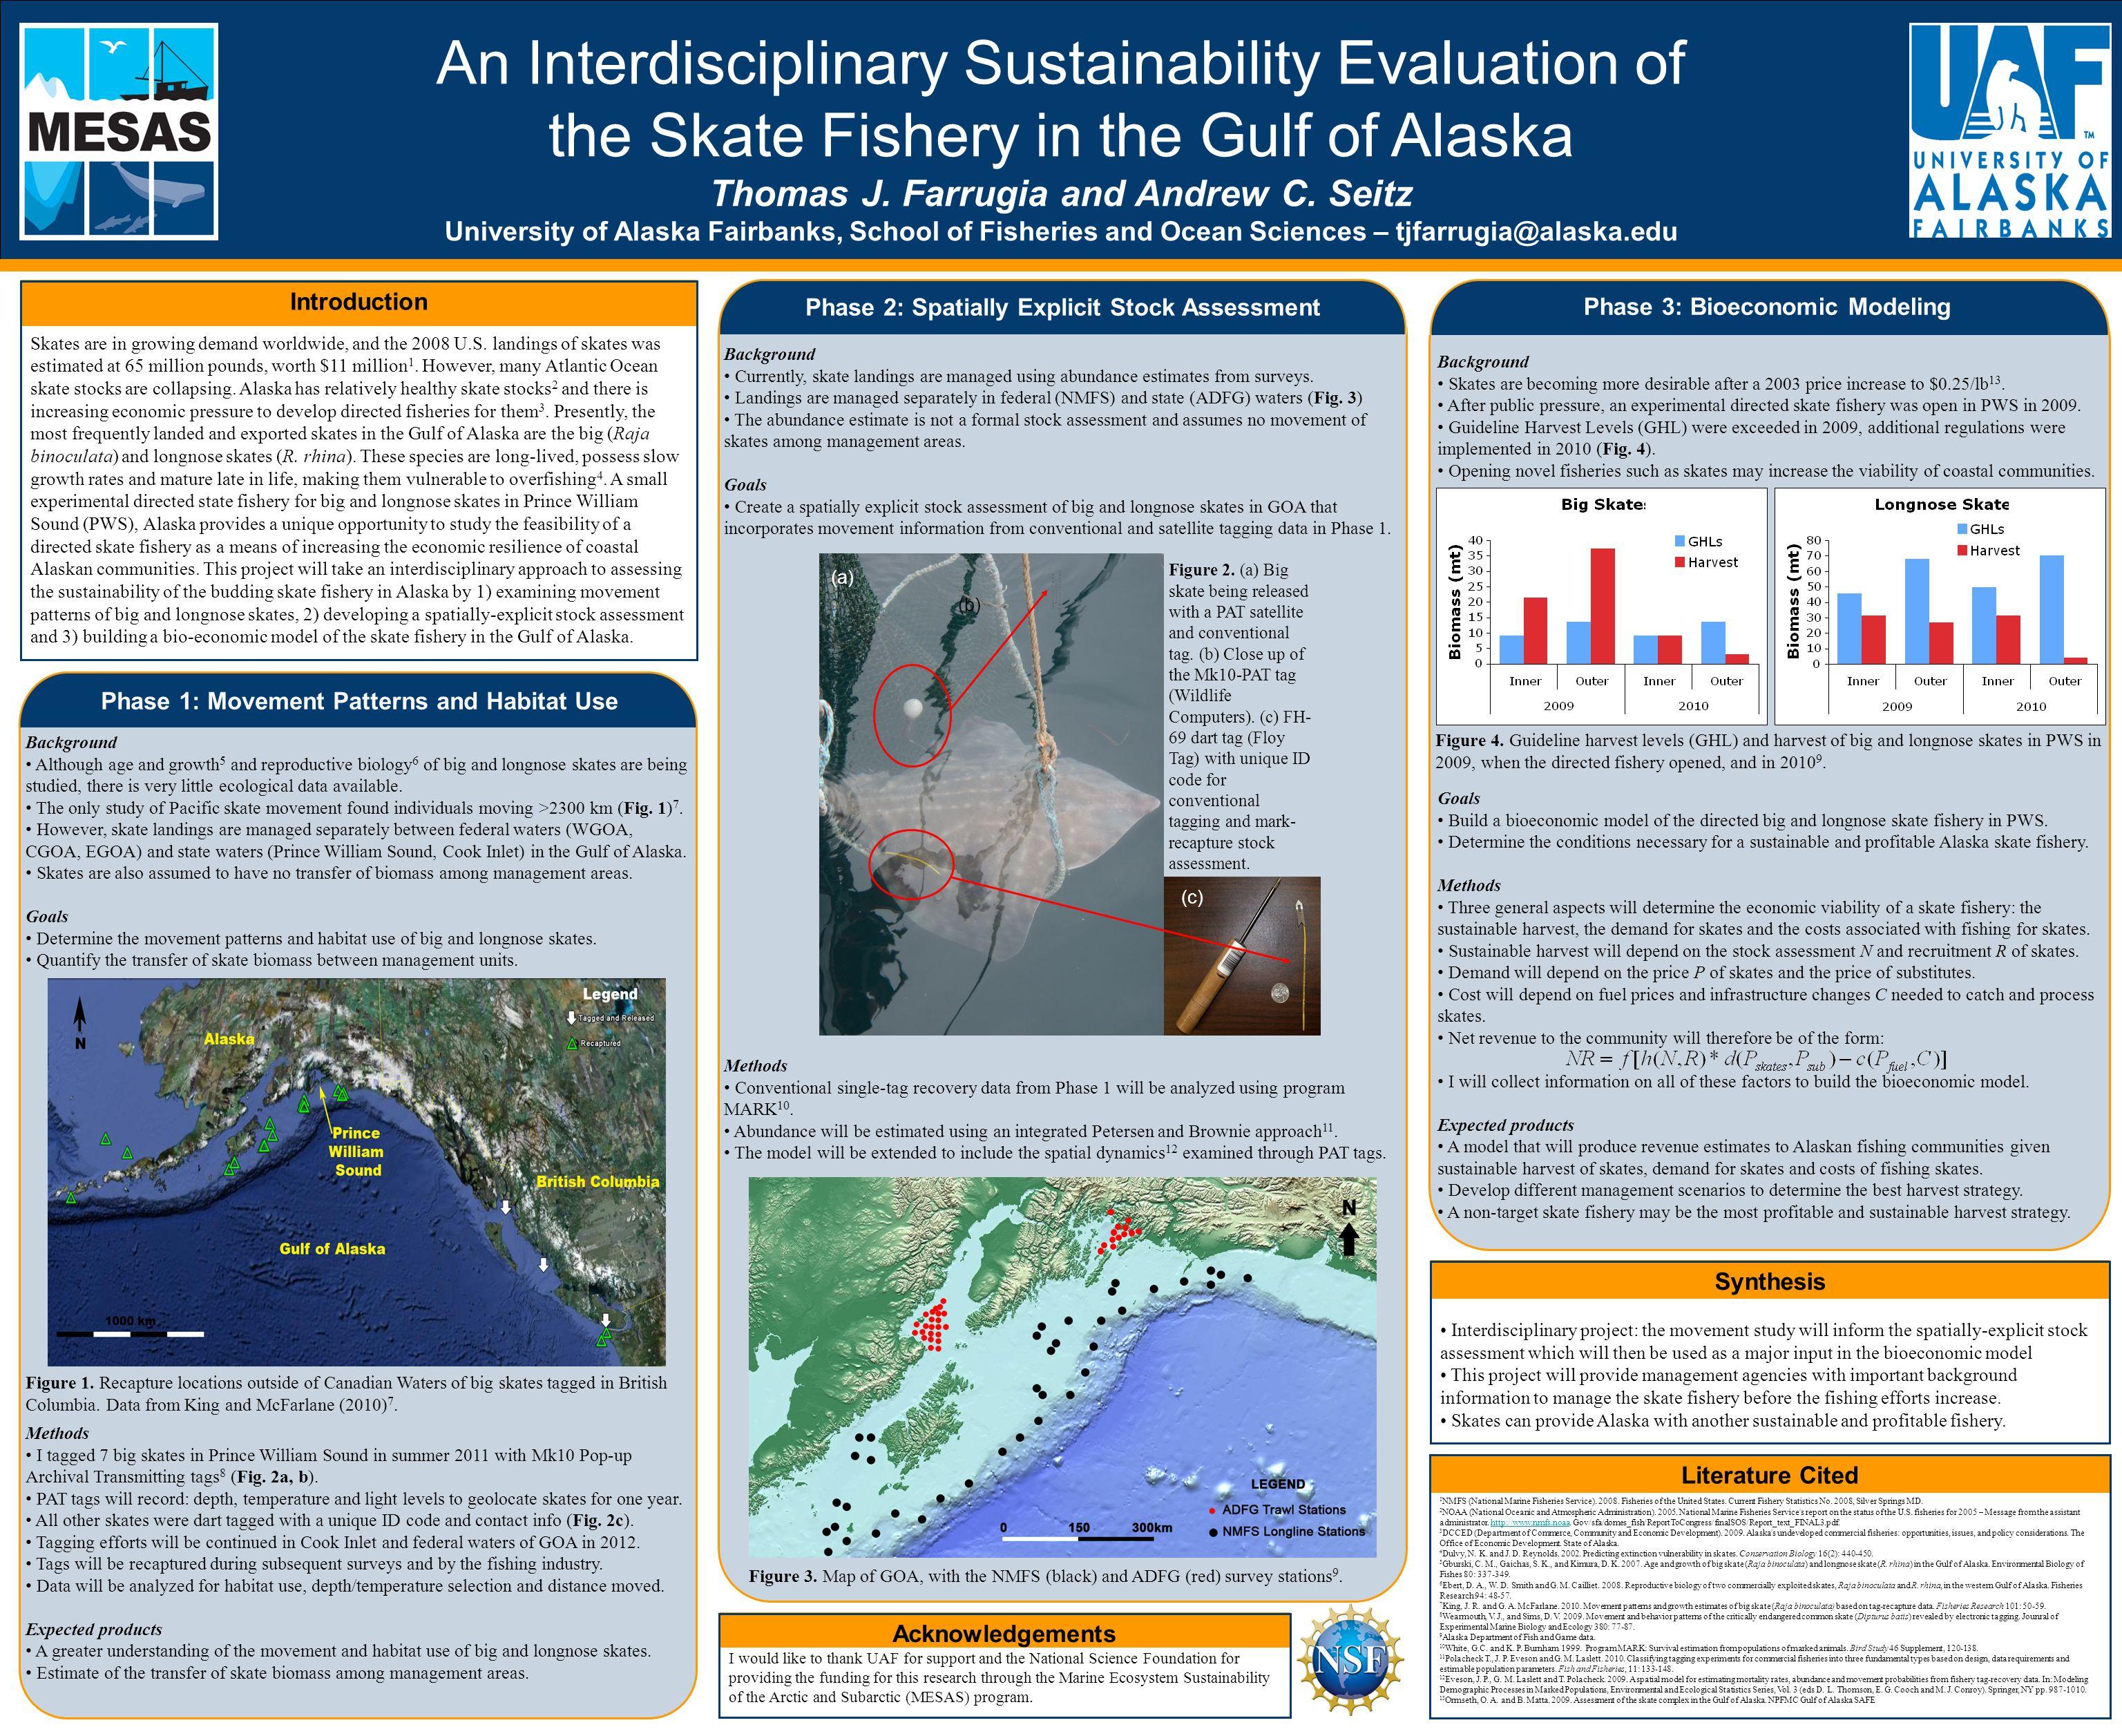 An Interdisciplinary Sustainability Evaluation of the Skate Fishery in the Gulf of Alaska Thomas J. Farrugia and Andrew C. Seitz University of Alaska